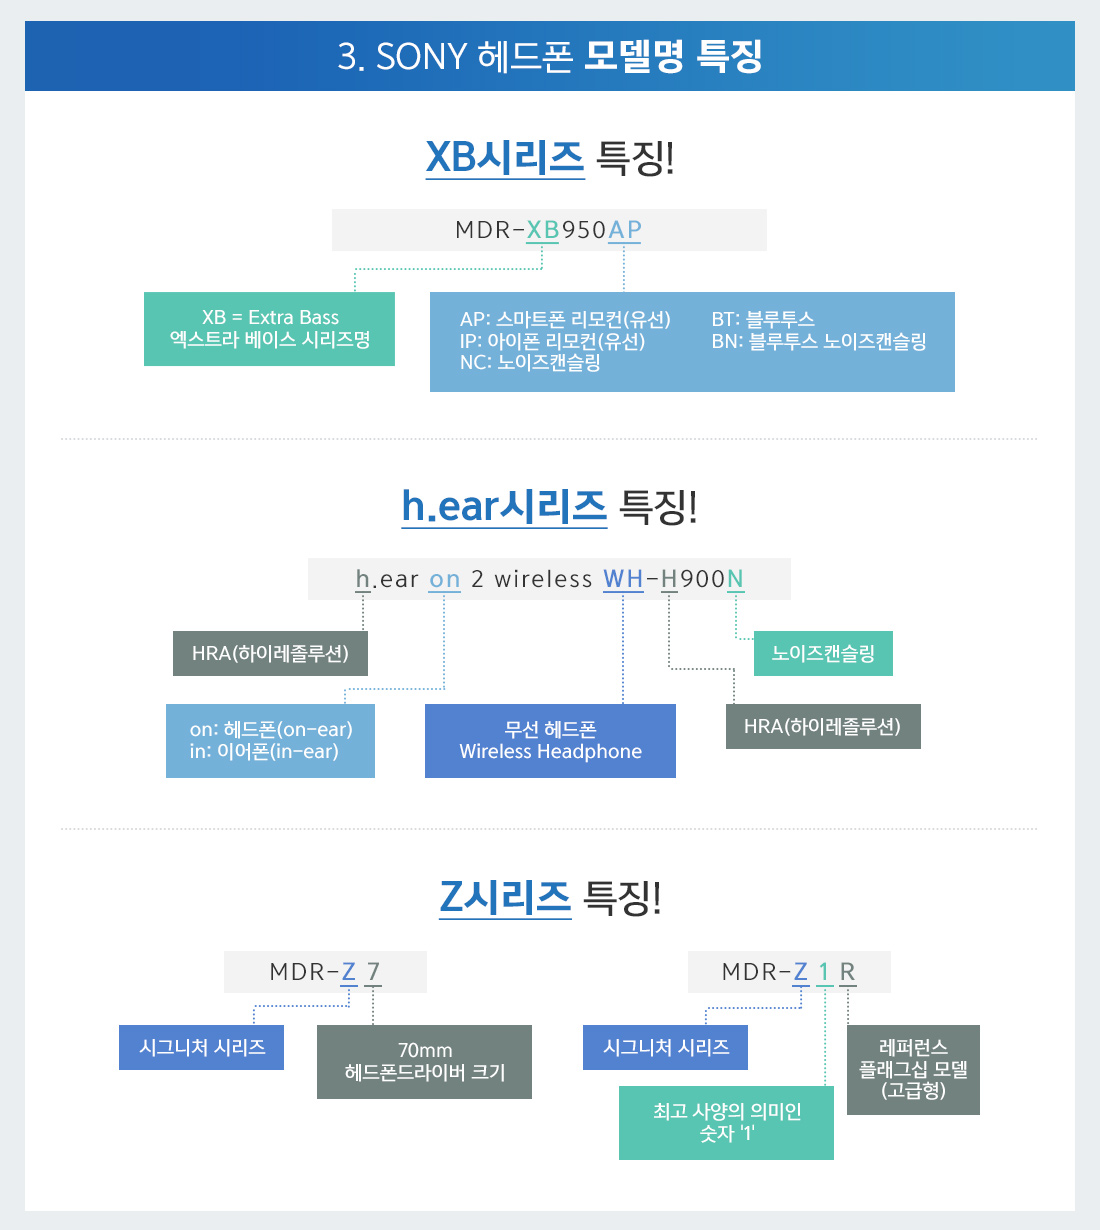 3. SONY 헤드폰 모델명 특징